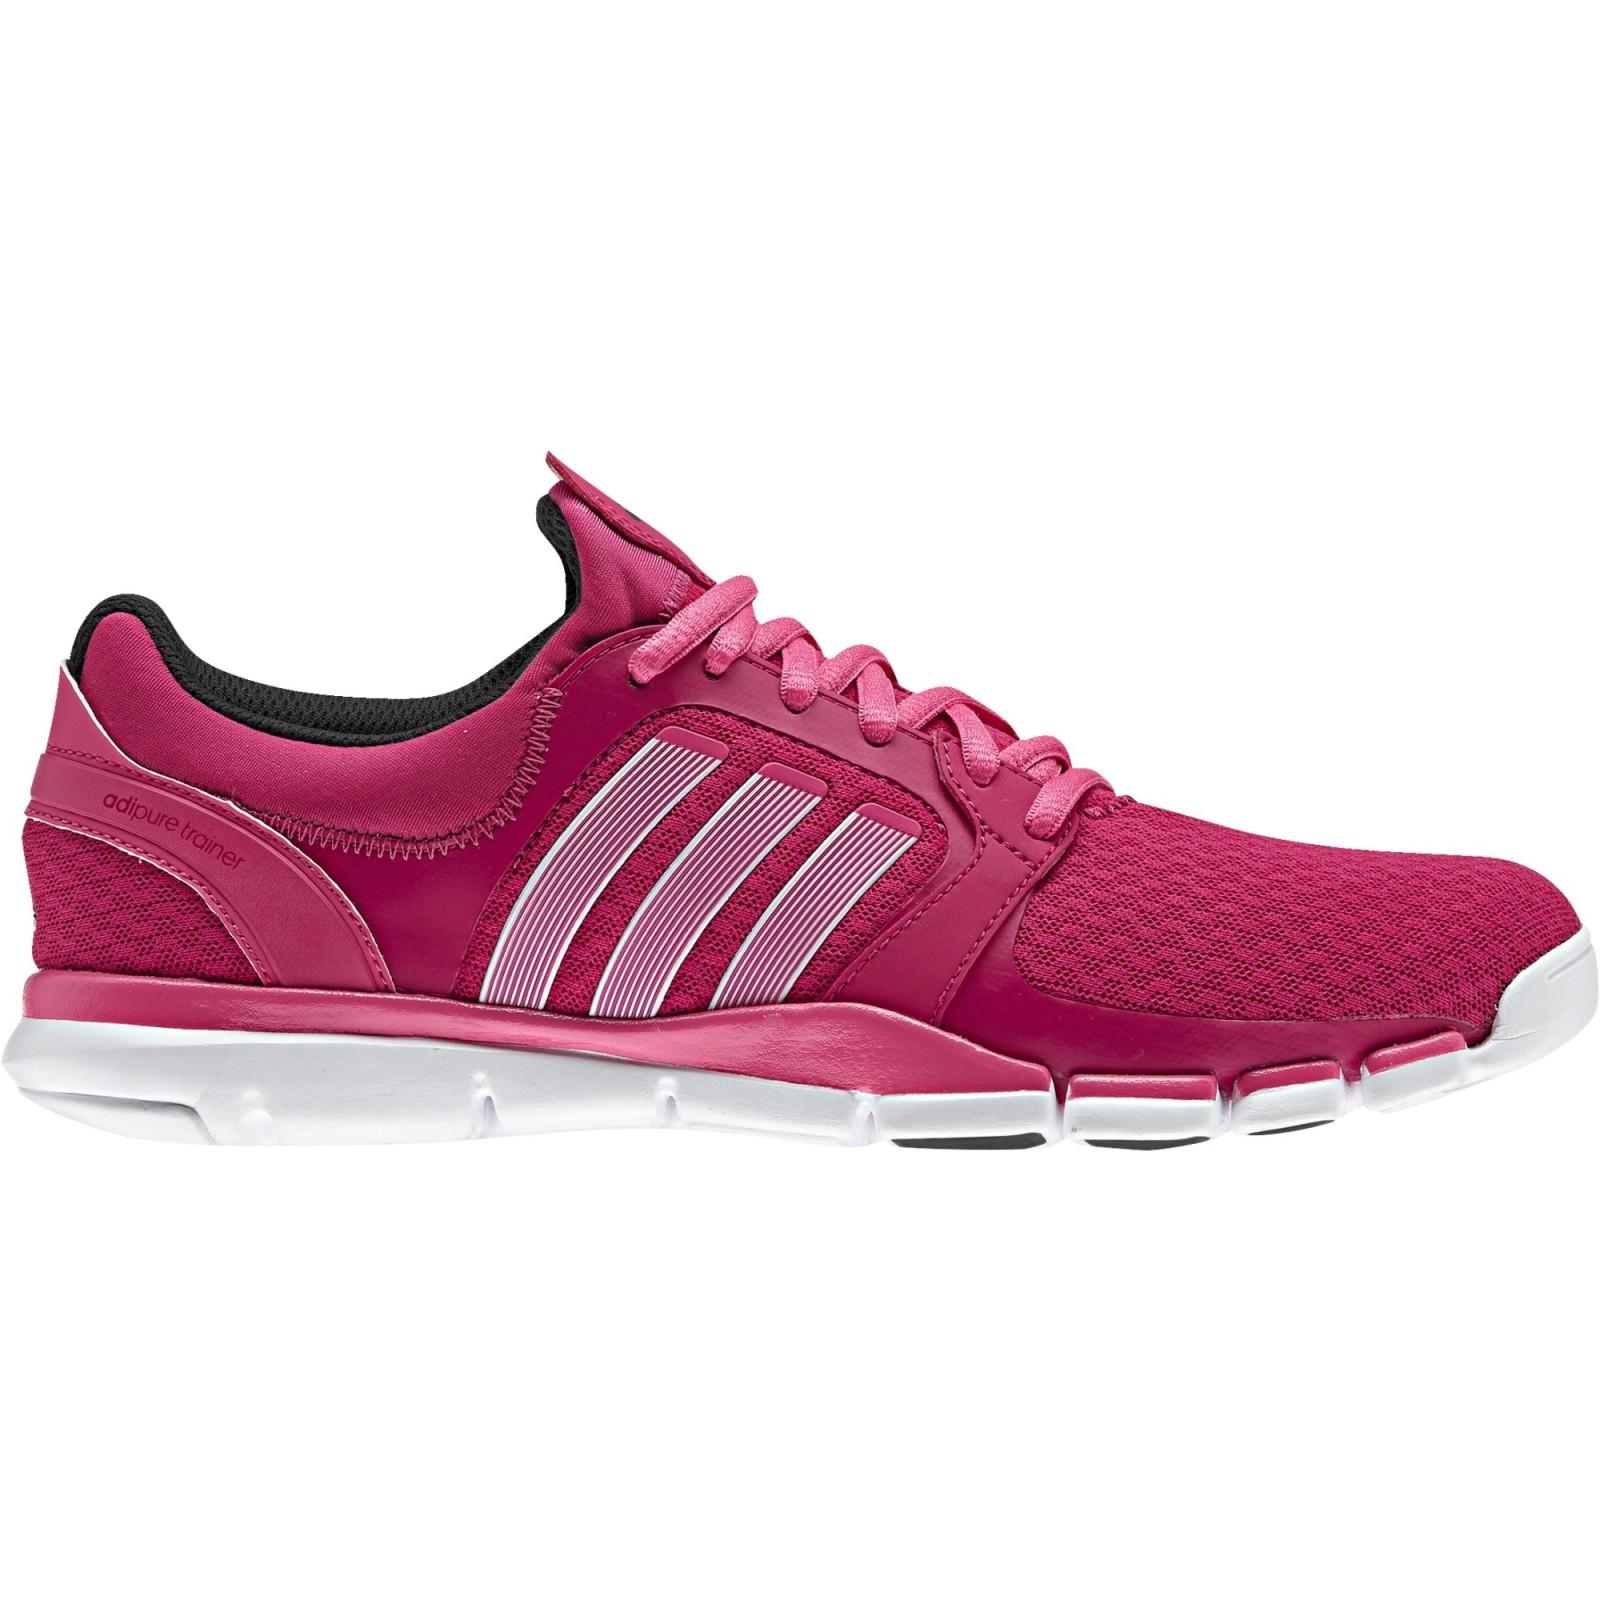 83cec0ed48b Dámská fitness obuv adidas adipure Tr 360 W